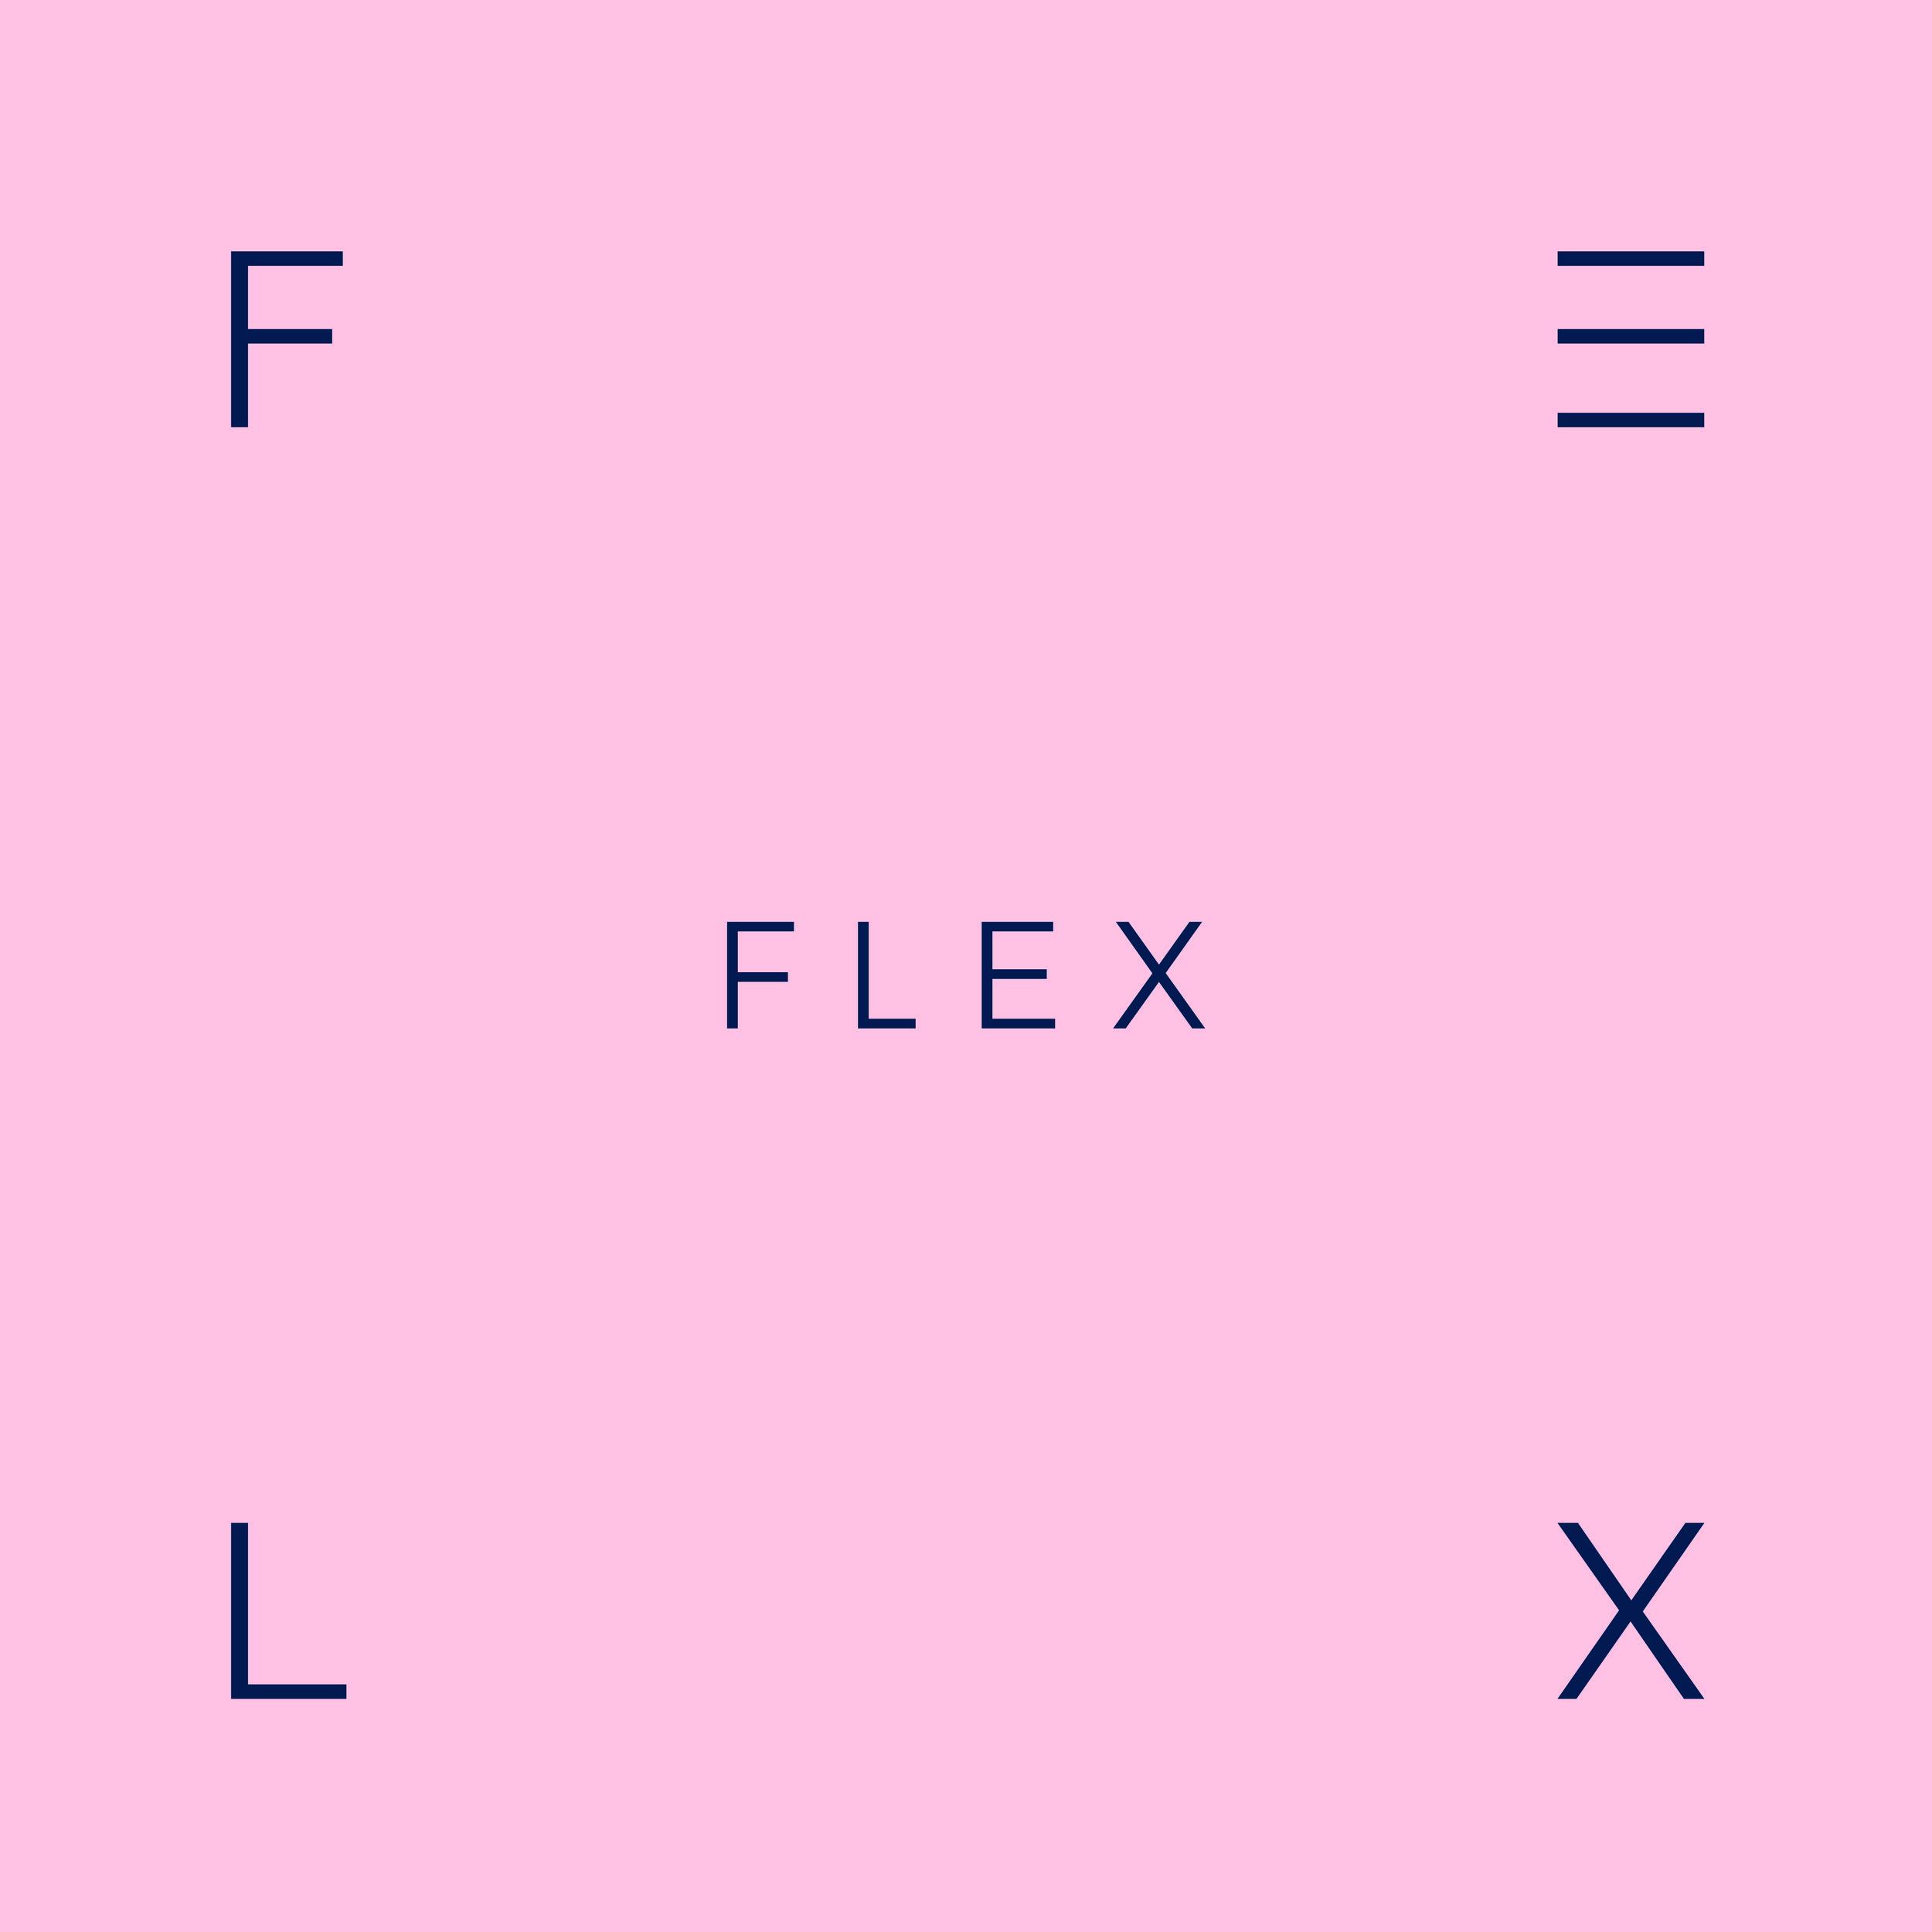 Flex_Instagram_Content-06.jpg